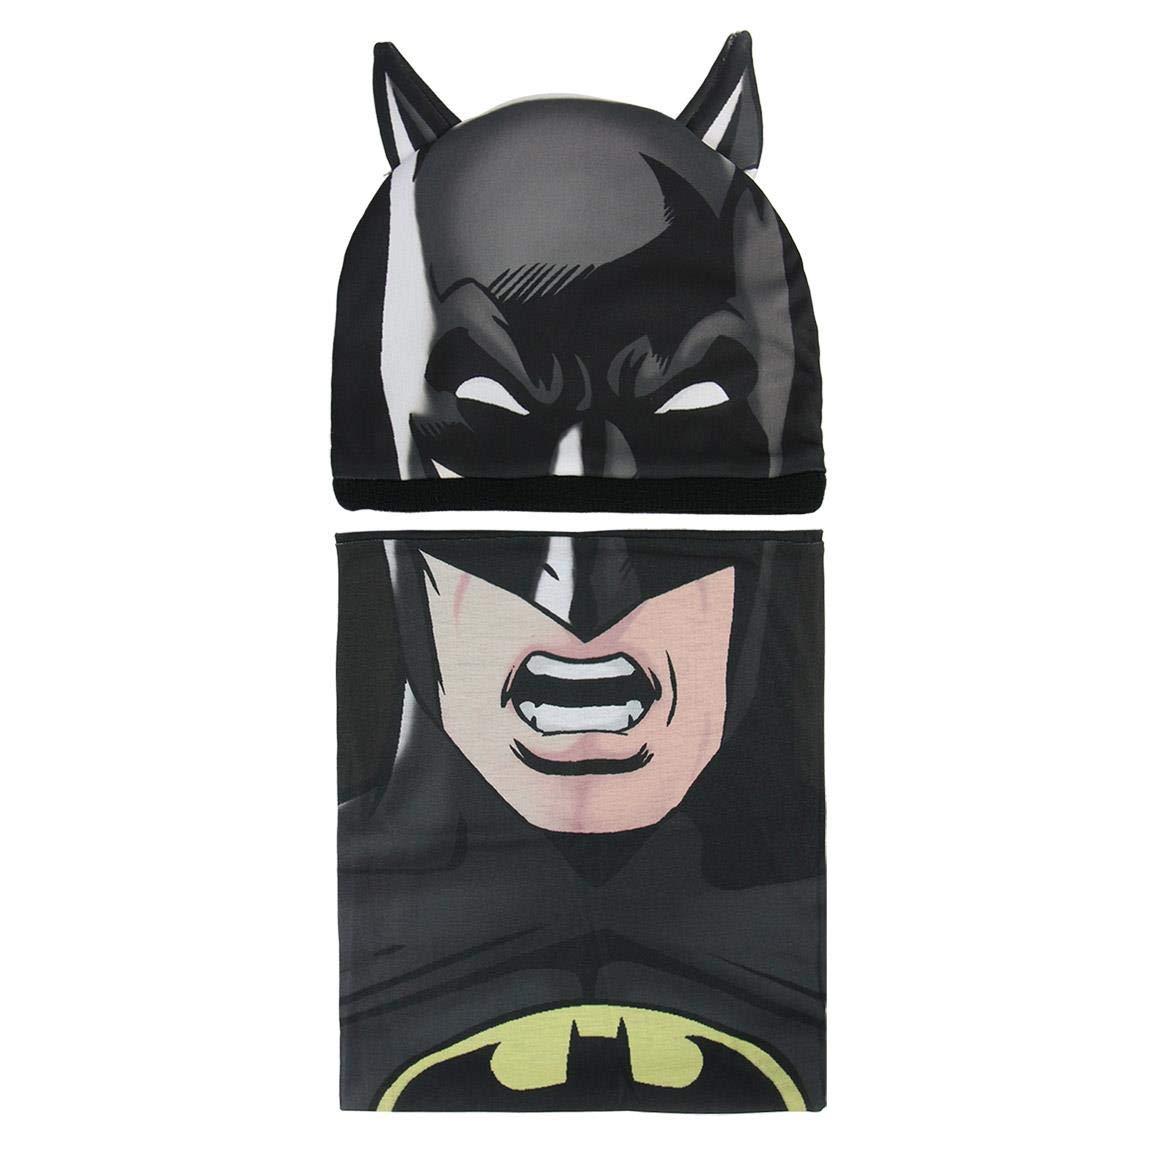 Cerdá Boy's Conjunto 2 Piezas Batman Scarf, Hat and Glove Set, Black (Negro 001), One Size (Manufacturer Size: Única) 2200003296